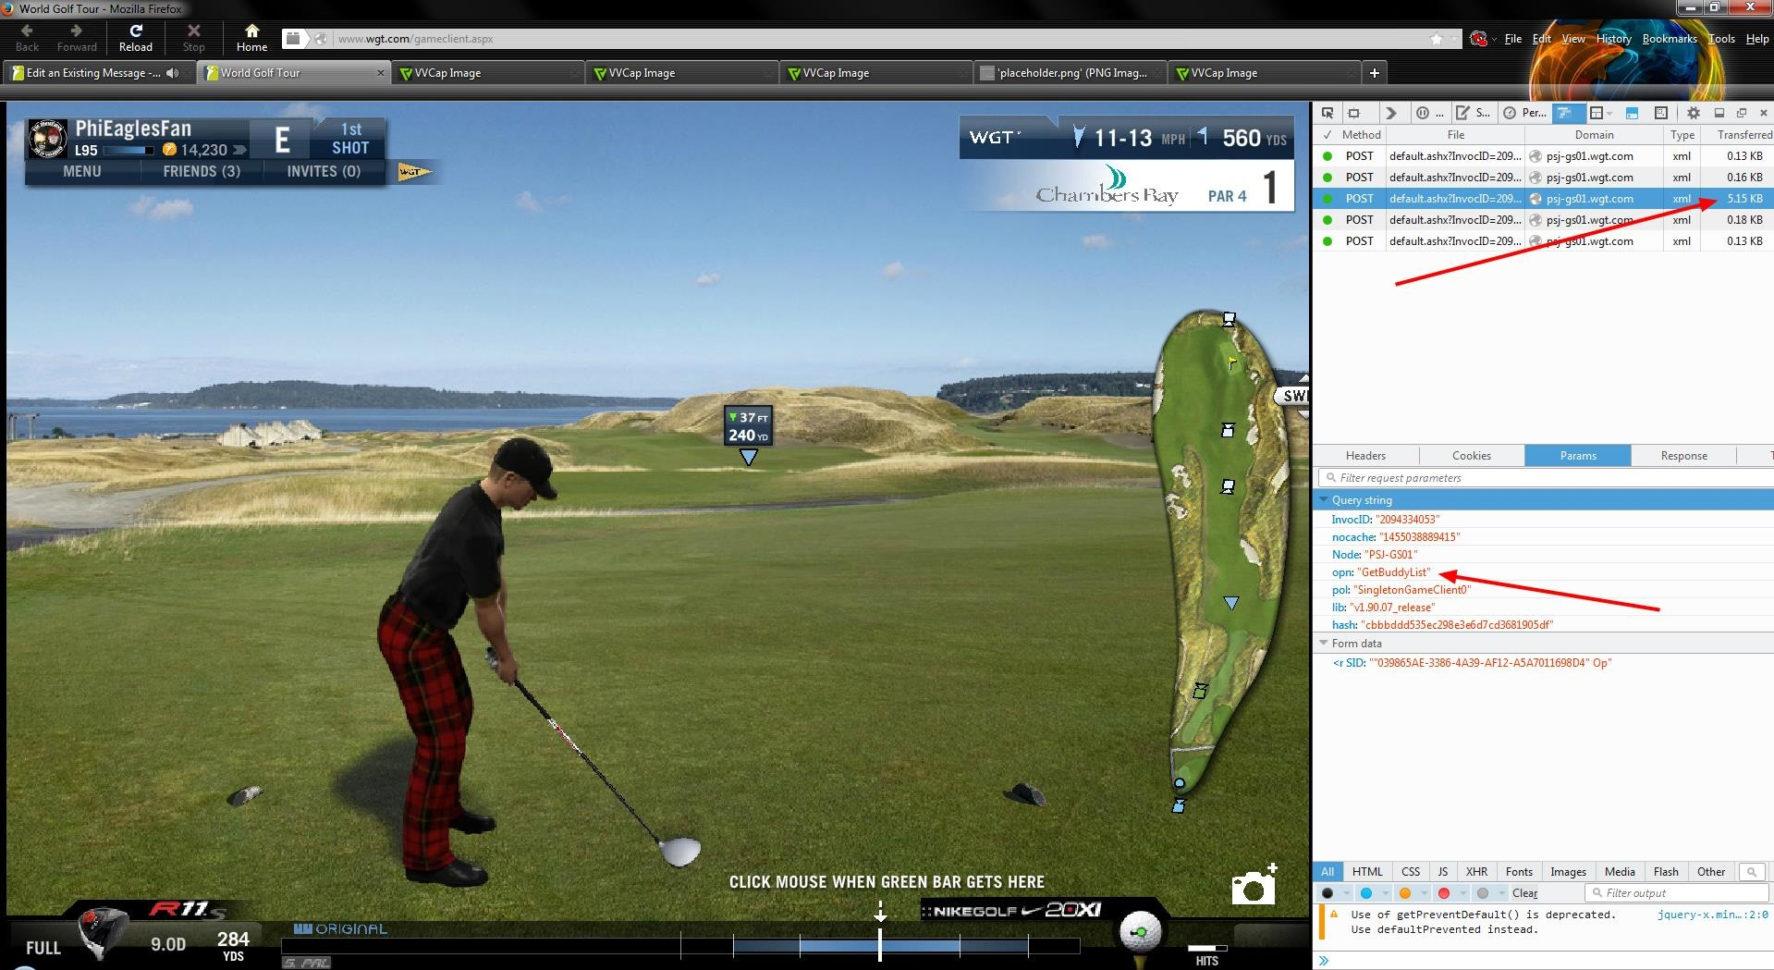 Golf Clash Best Clubs Spreadsheet For Golf Clash Best Clubs Luxury 15 Elegant Golf Clash Club Stats